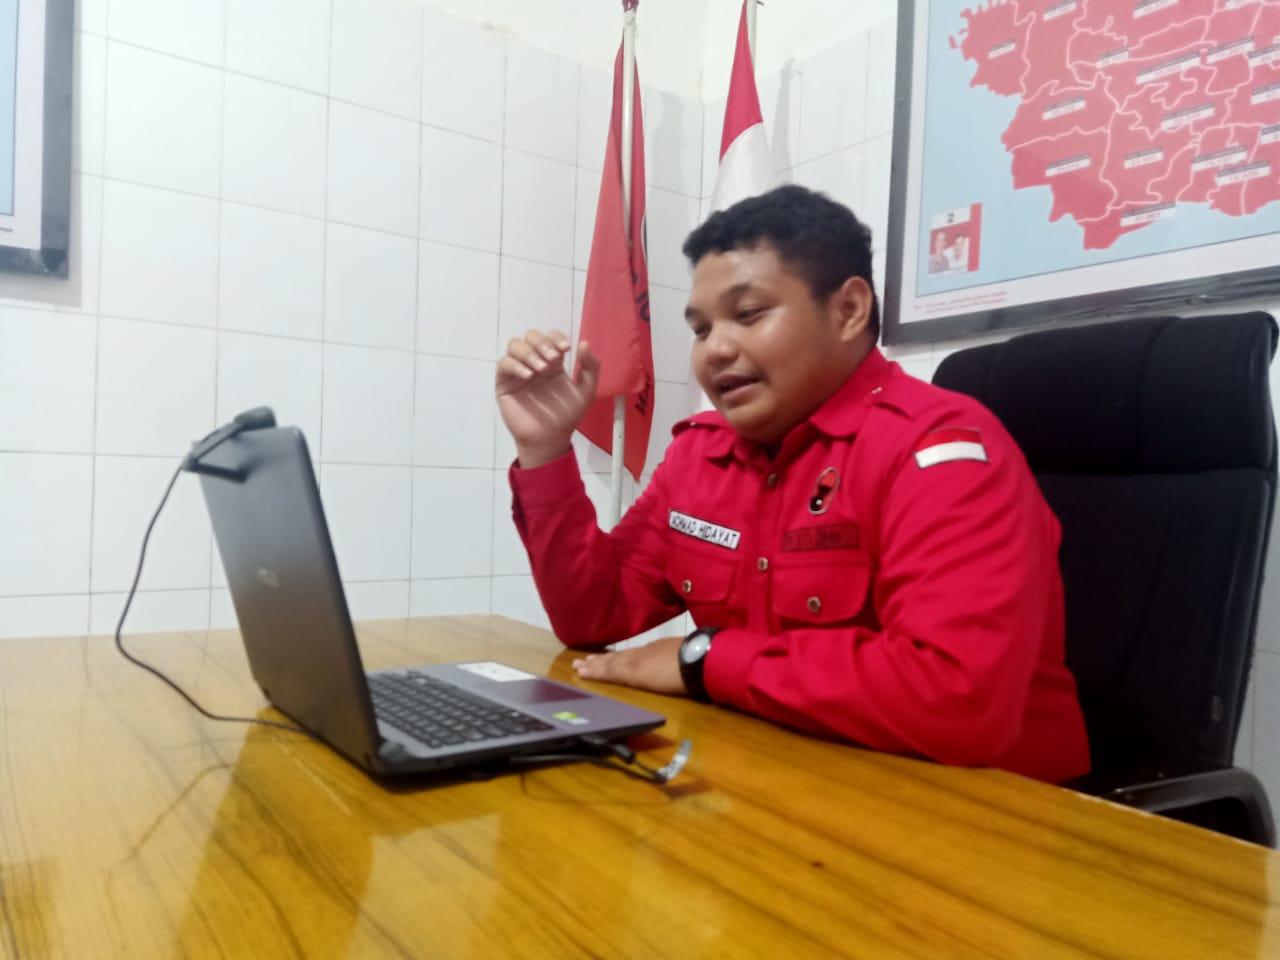 Achmad Hidayat Suntik Semangat Kader muda IPNU & IPPNU